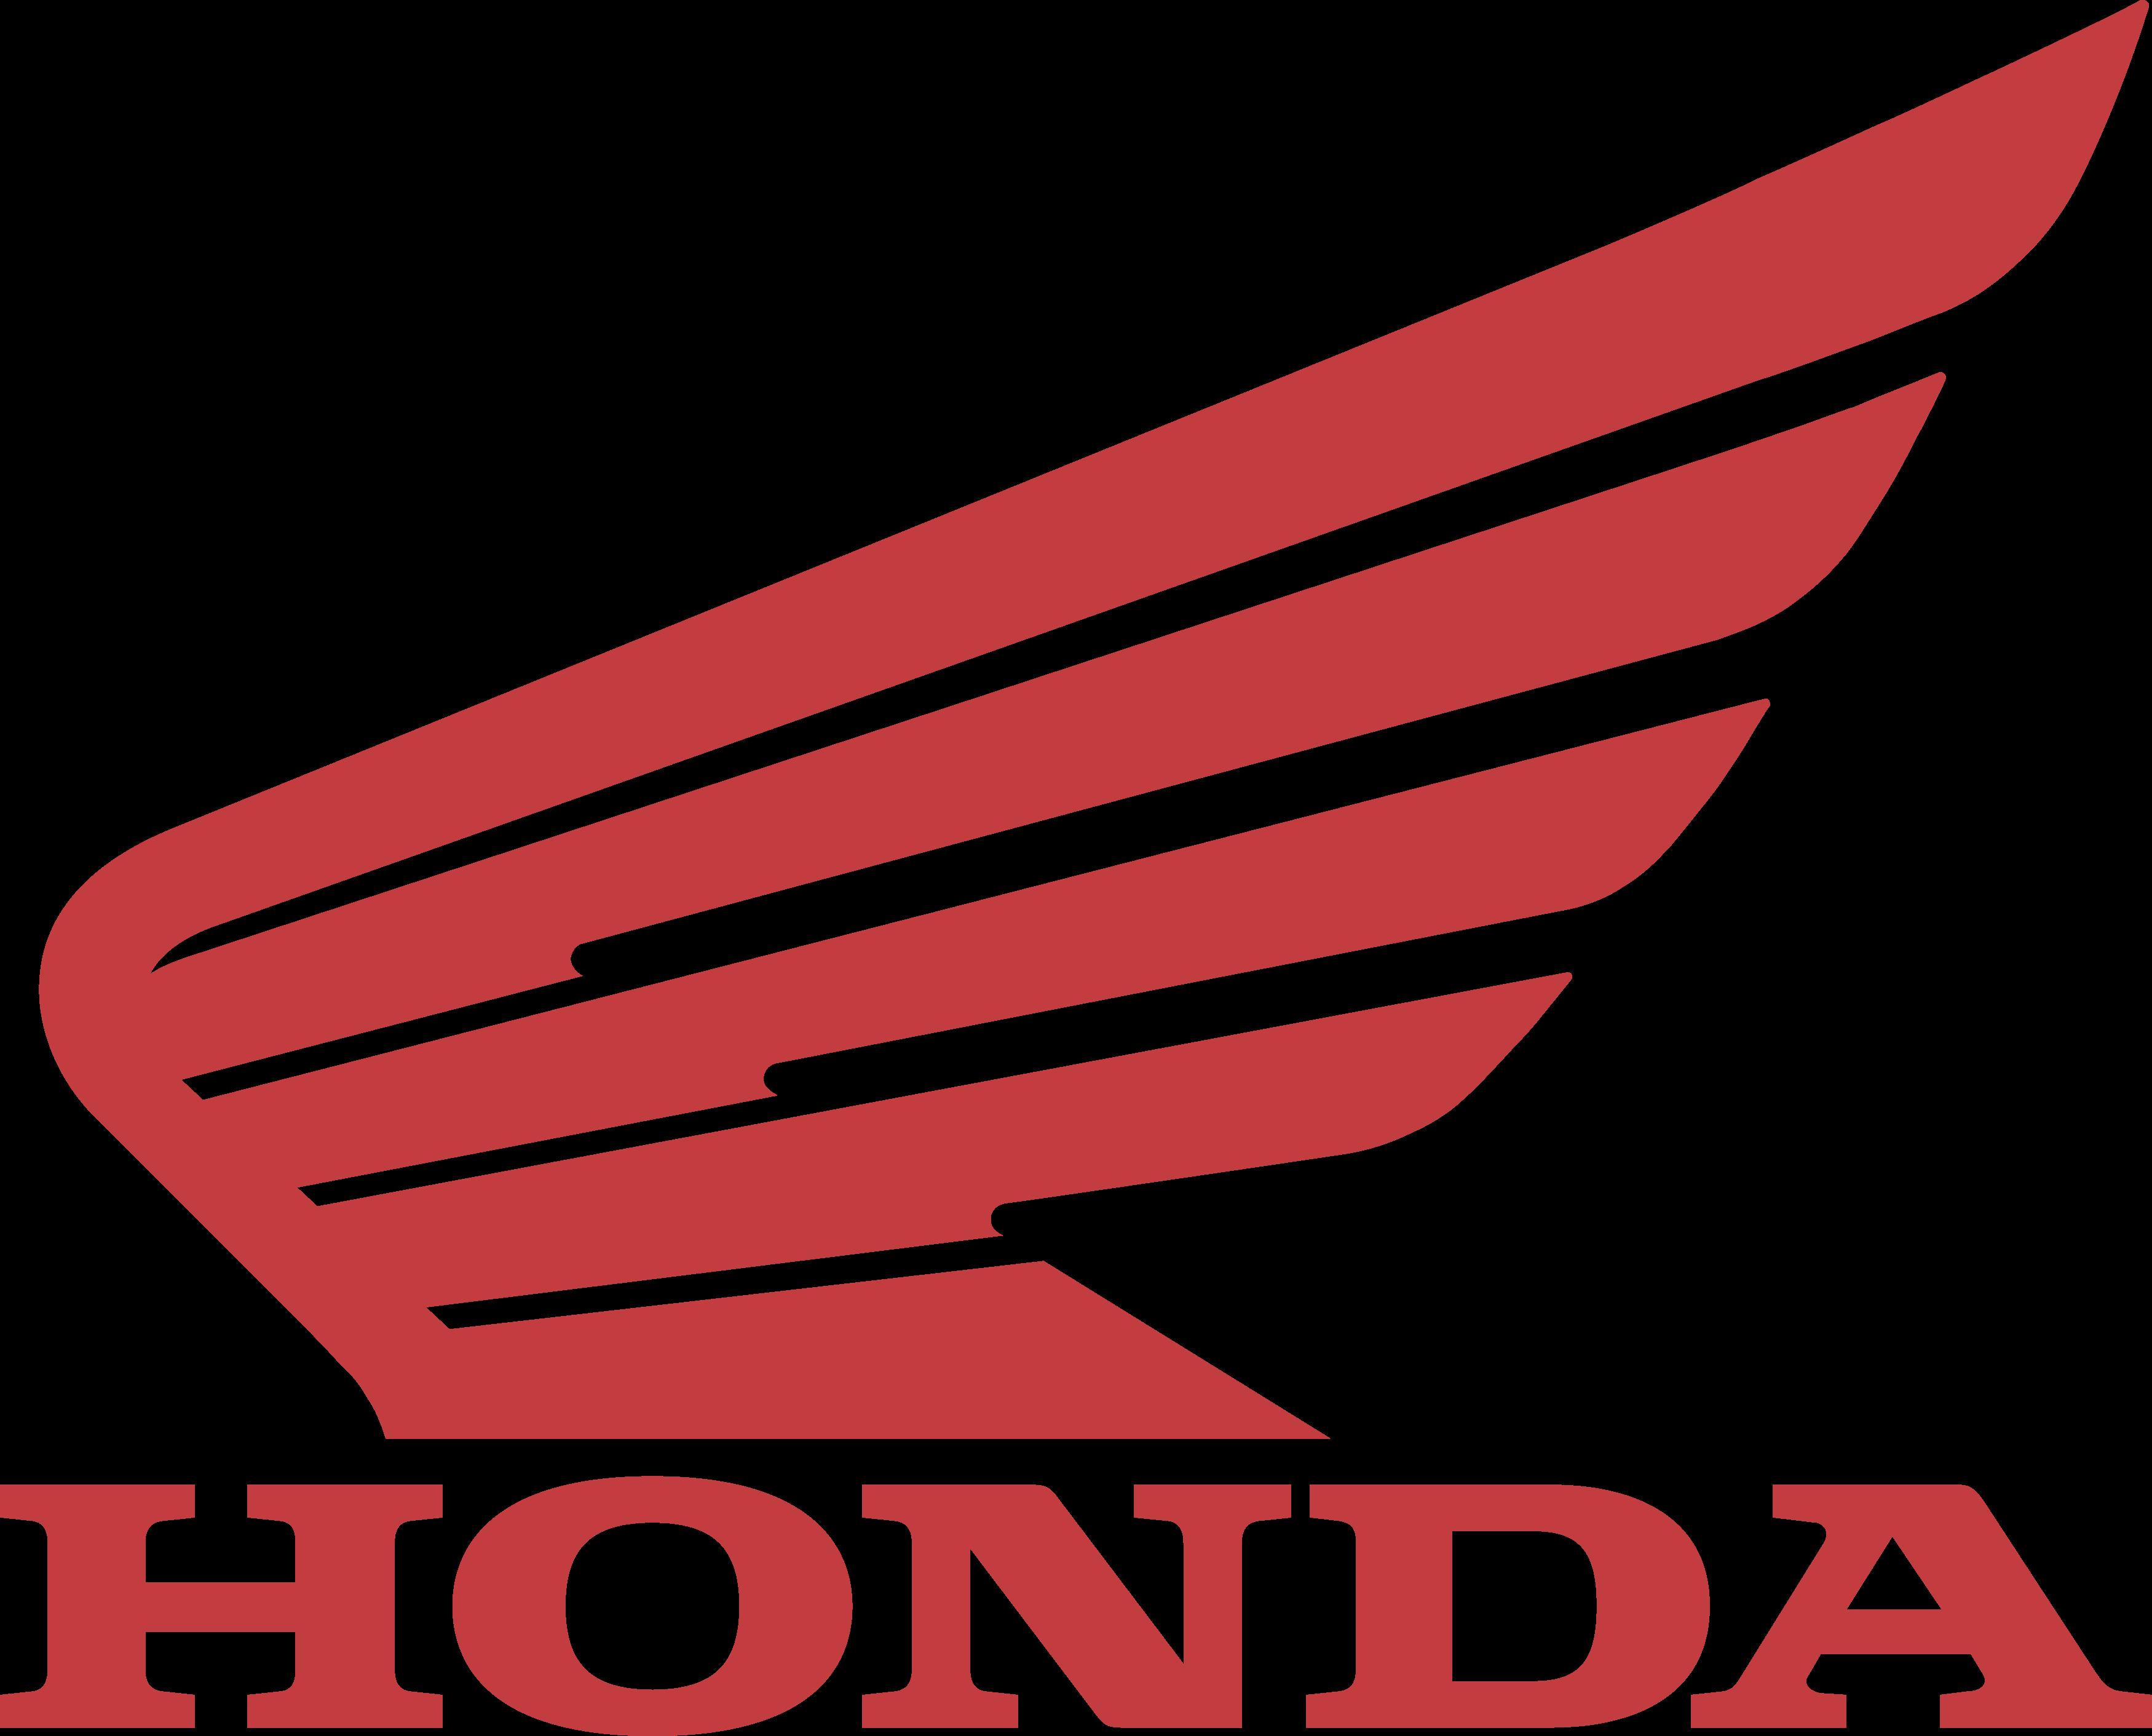 honda motos logo 00 - Honda Motocicletas Logo